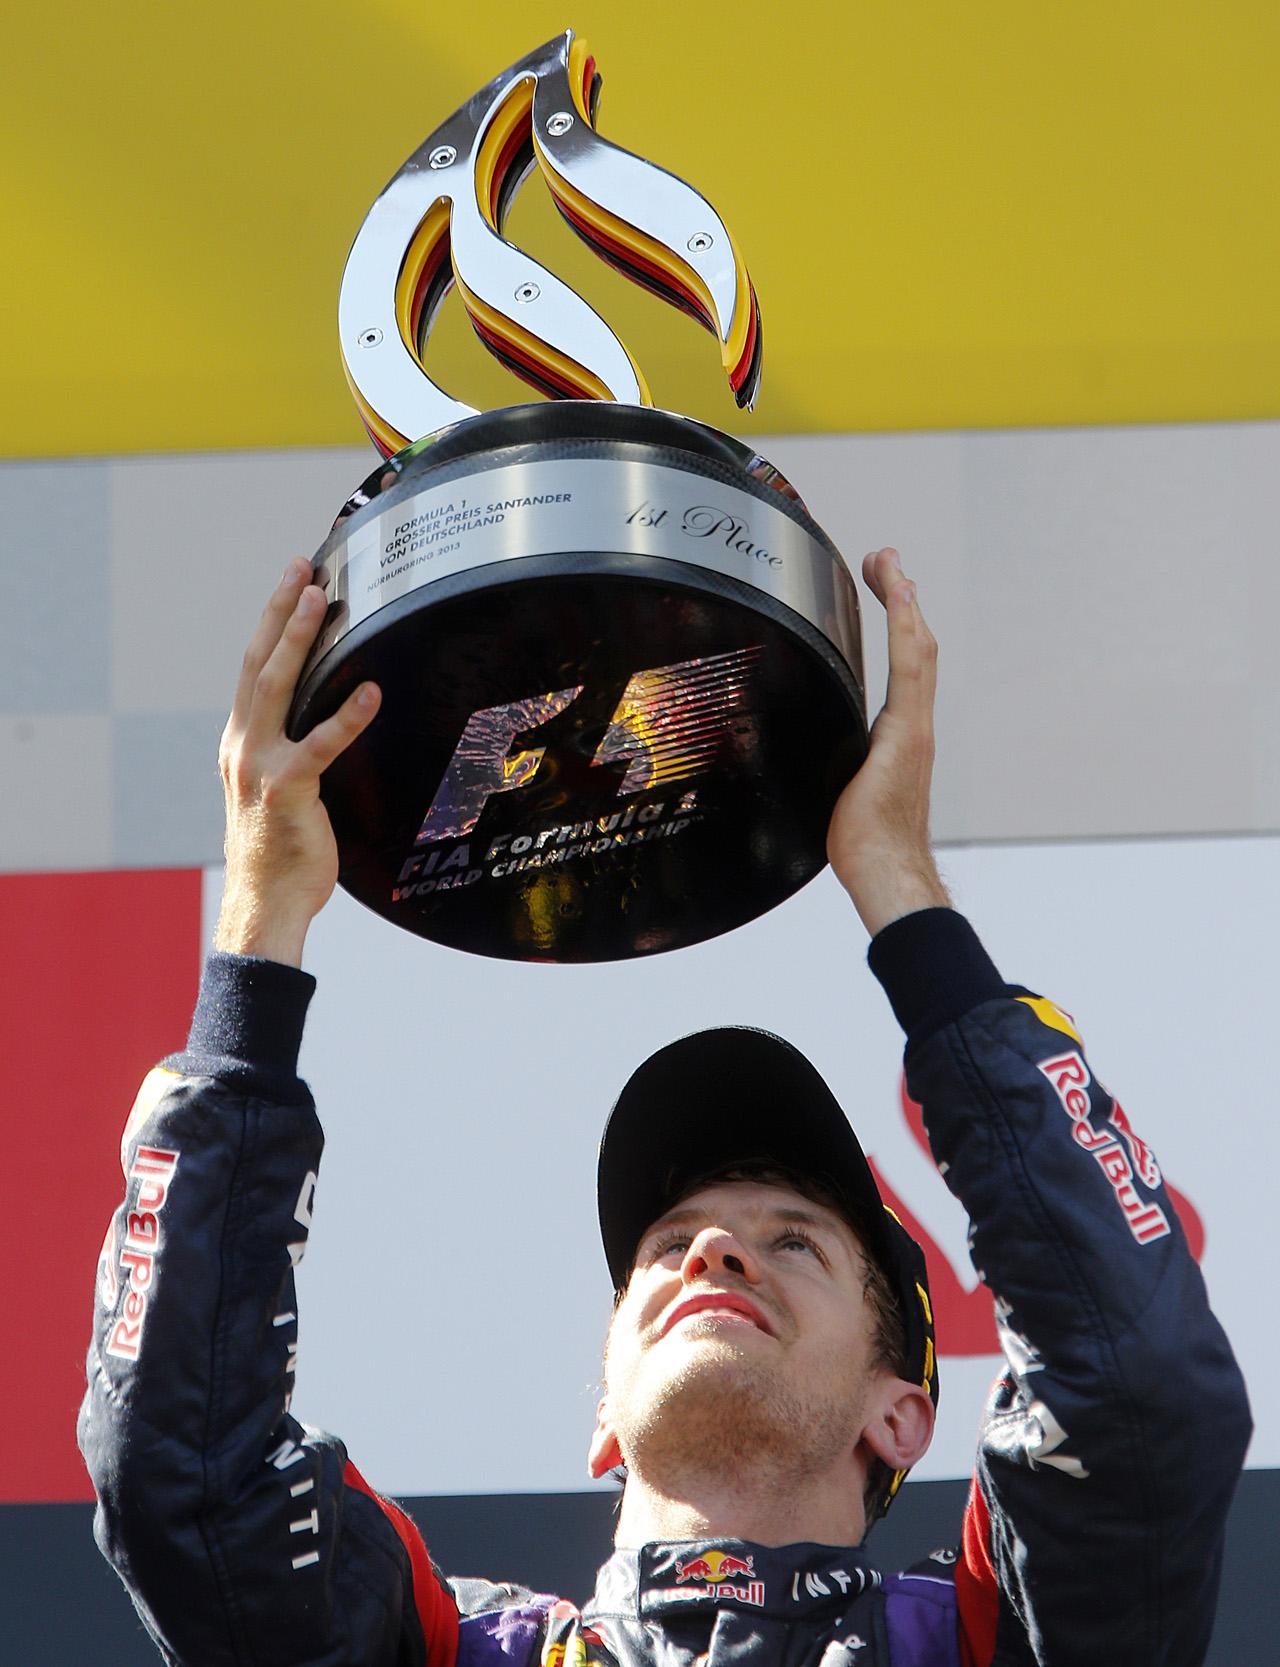 Vettel chiến thắng, Hamilton khóc thầm